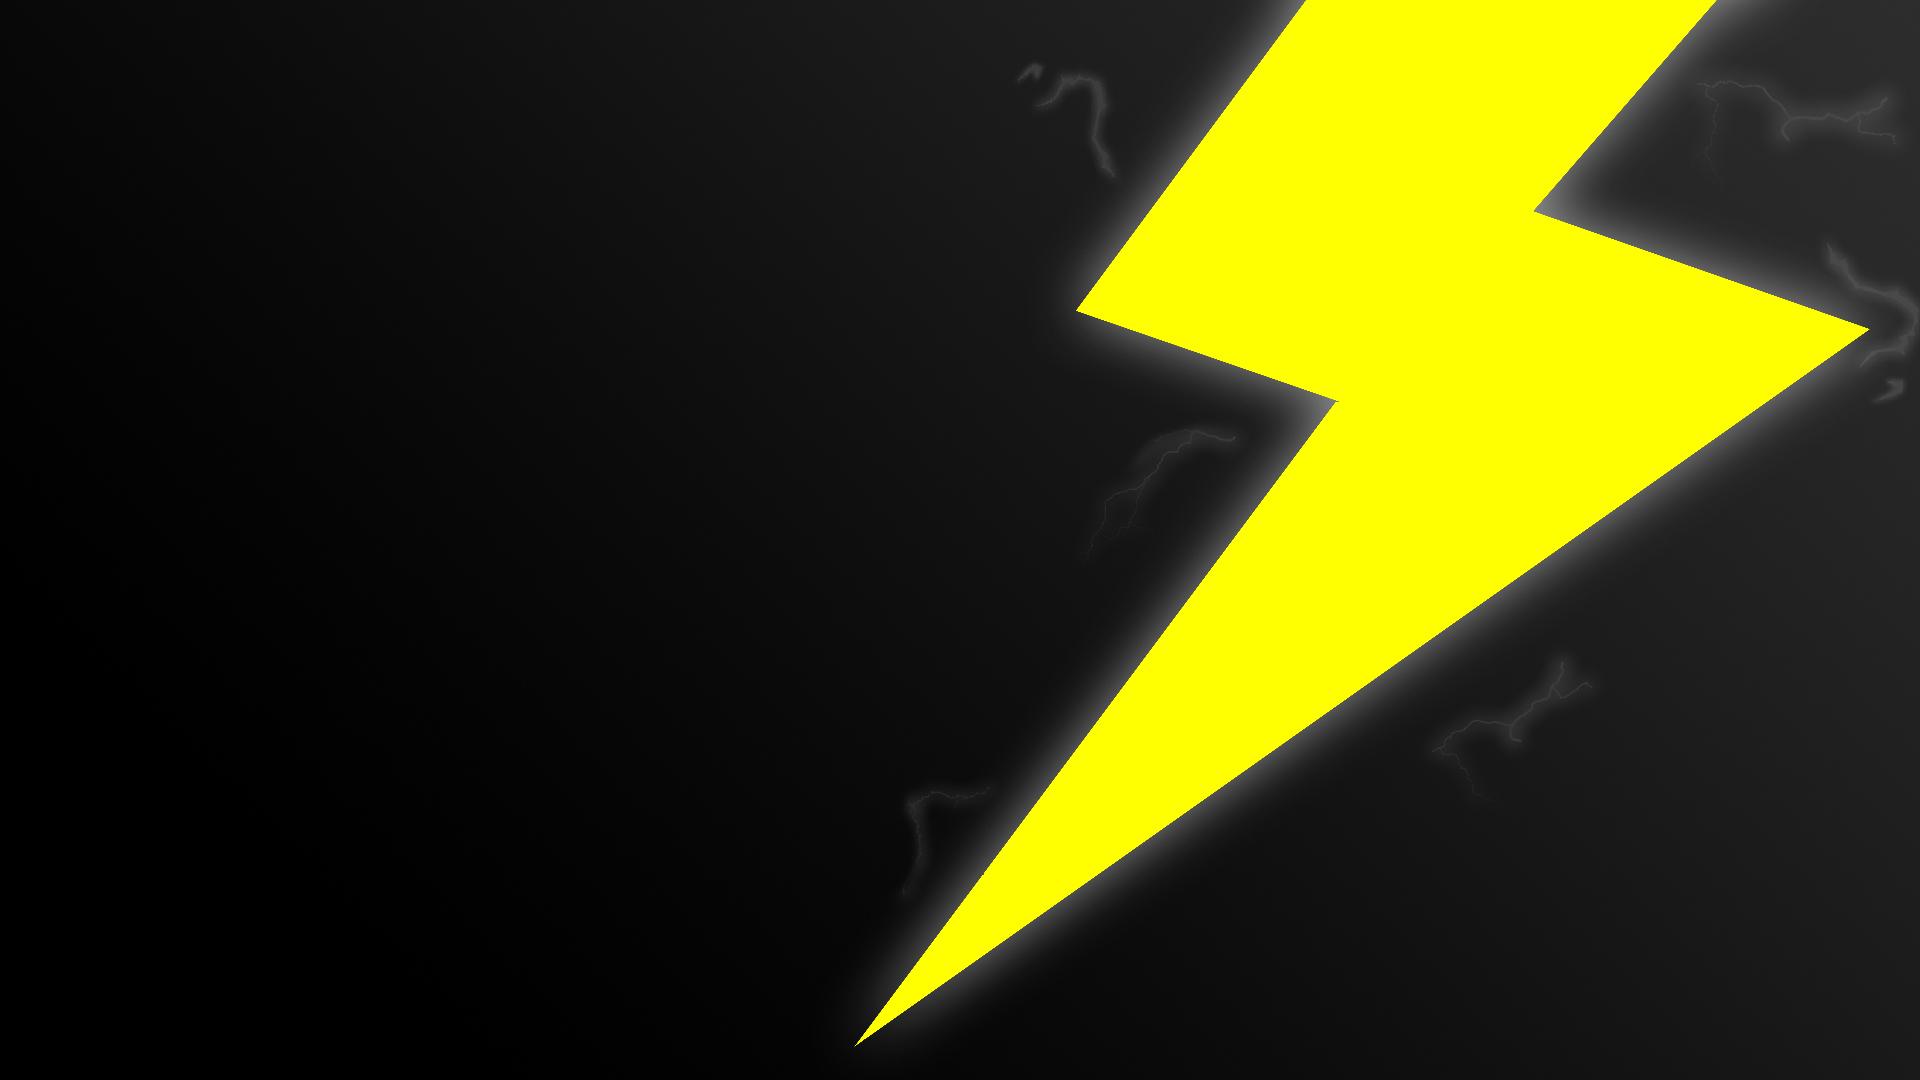 LIGHTNING 1920x1080